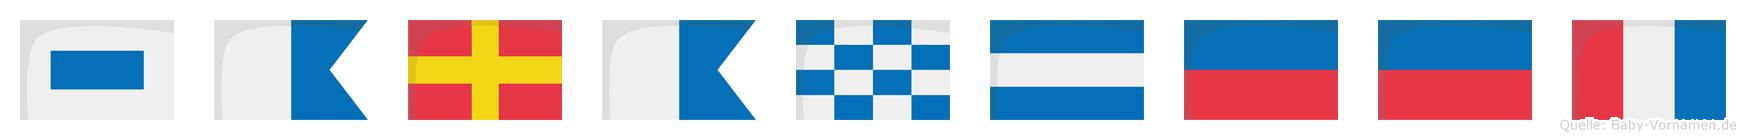 Saranjeet im Flaggenalphabet